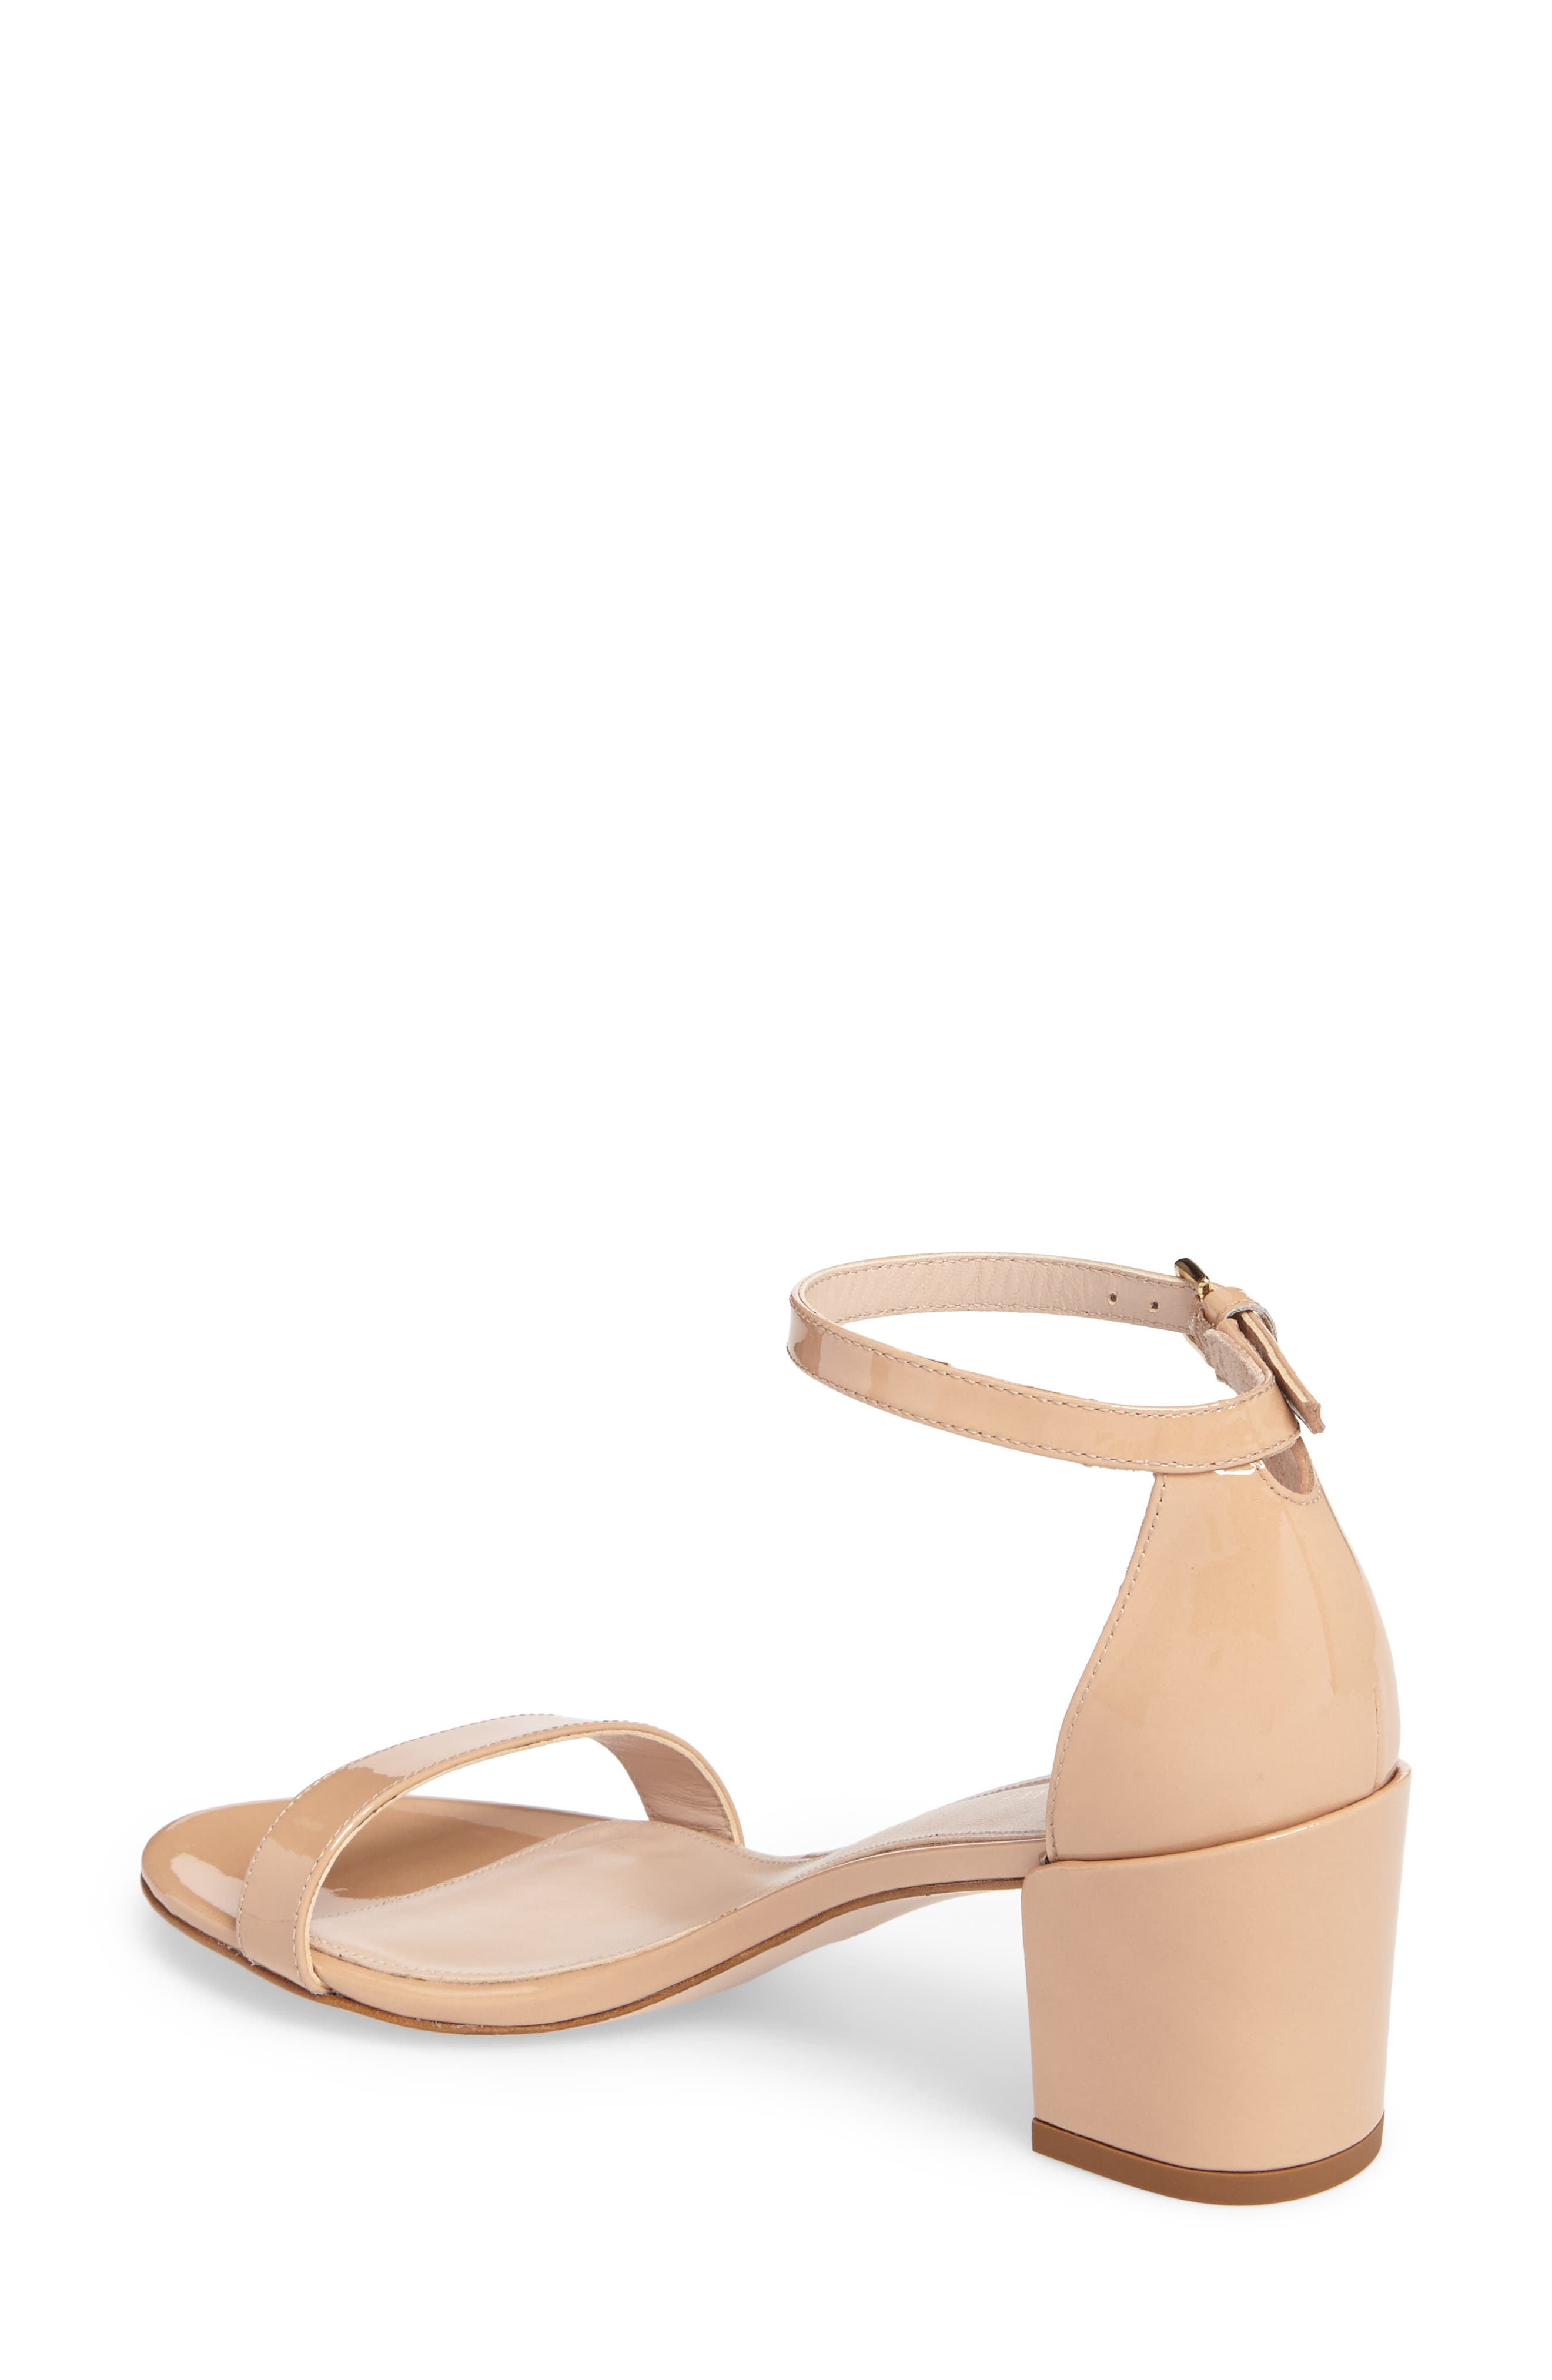 feeba0ecfb0 Block-Heel Sandals for Women